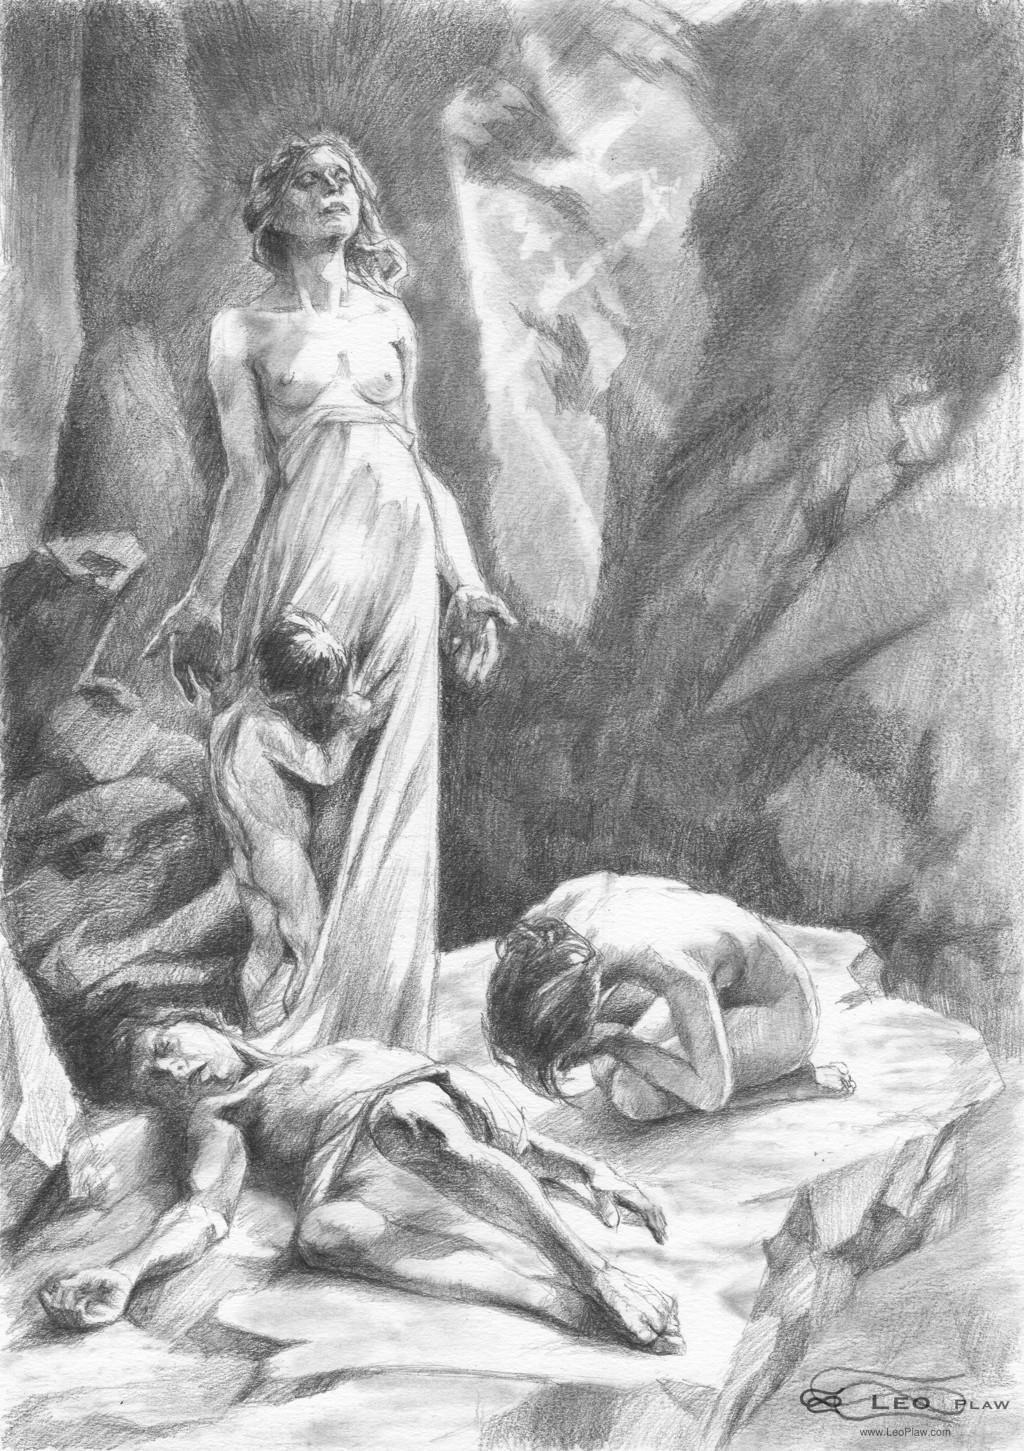 """Parting"", Leo Plaw, 21 x 29.7cm A4, graphite pencil on paper"